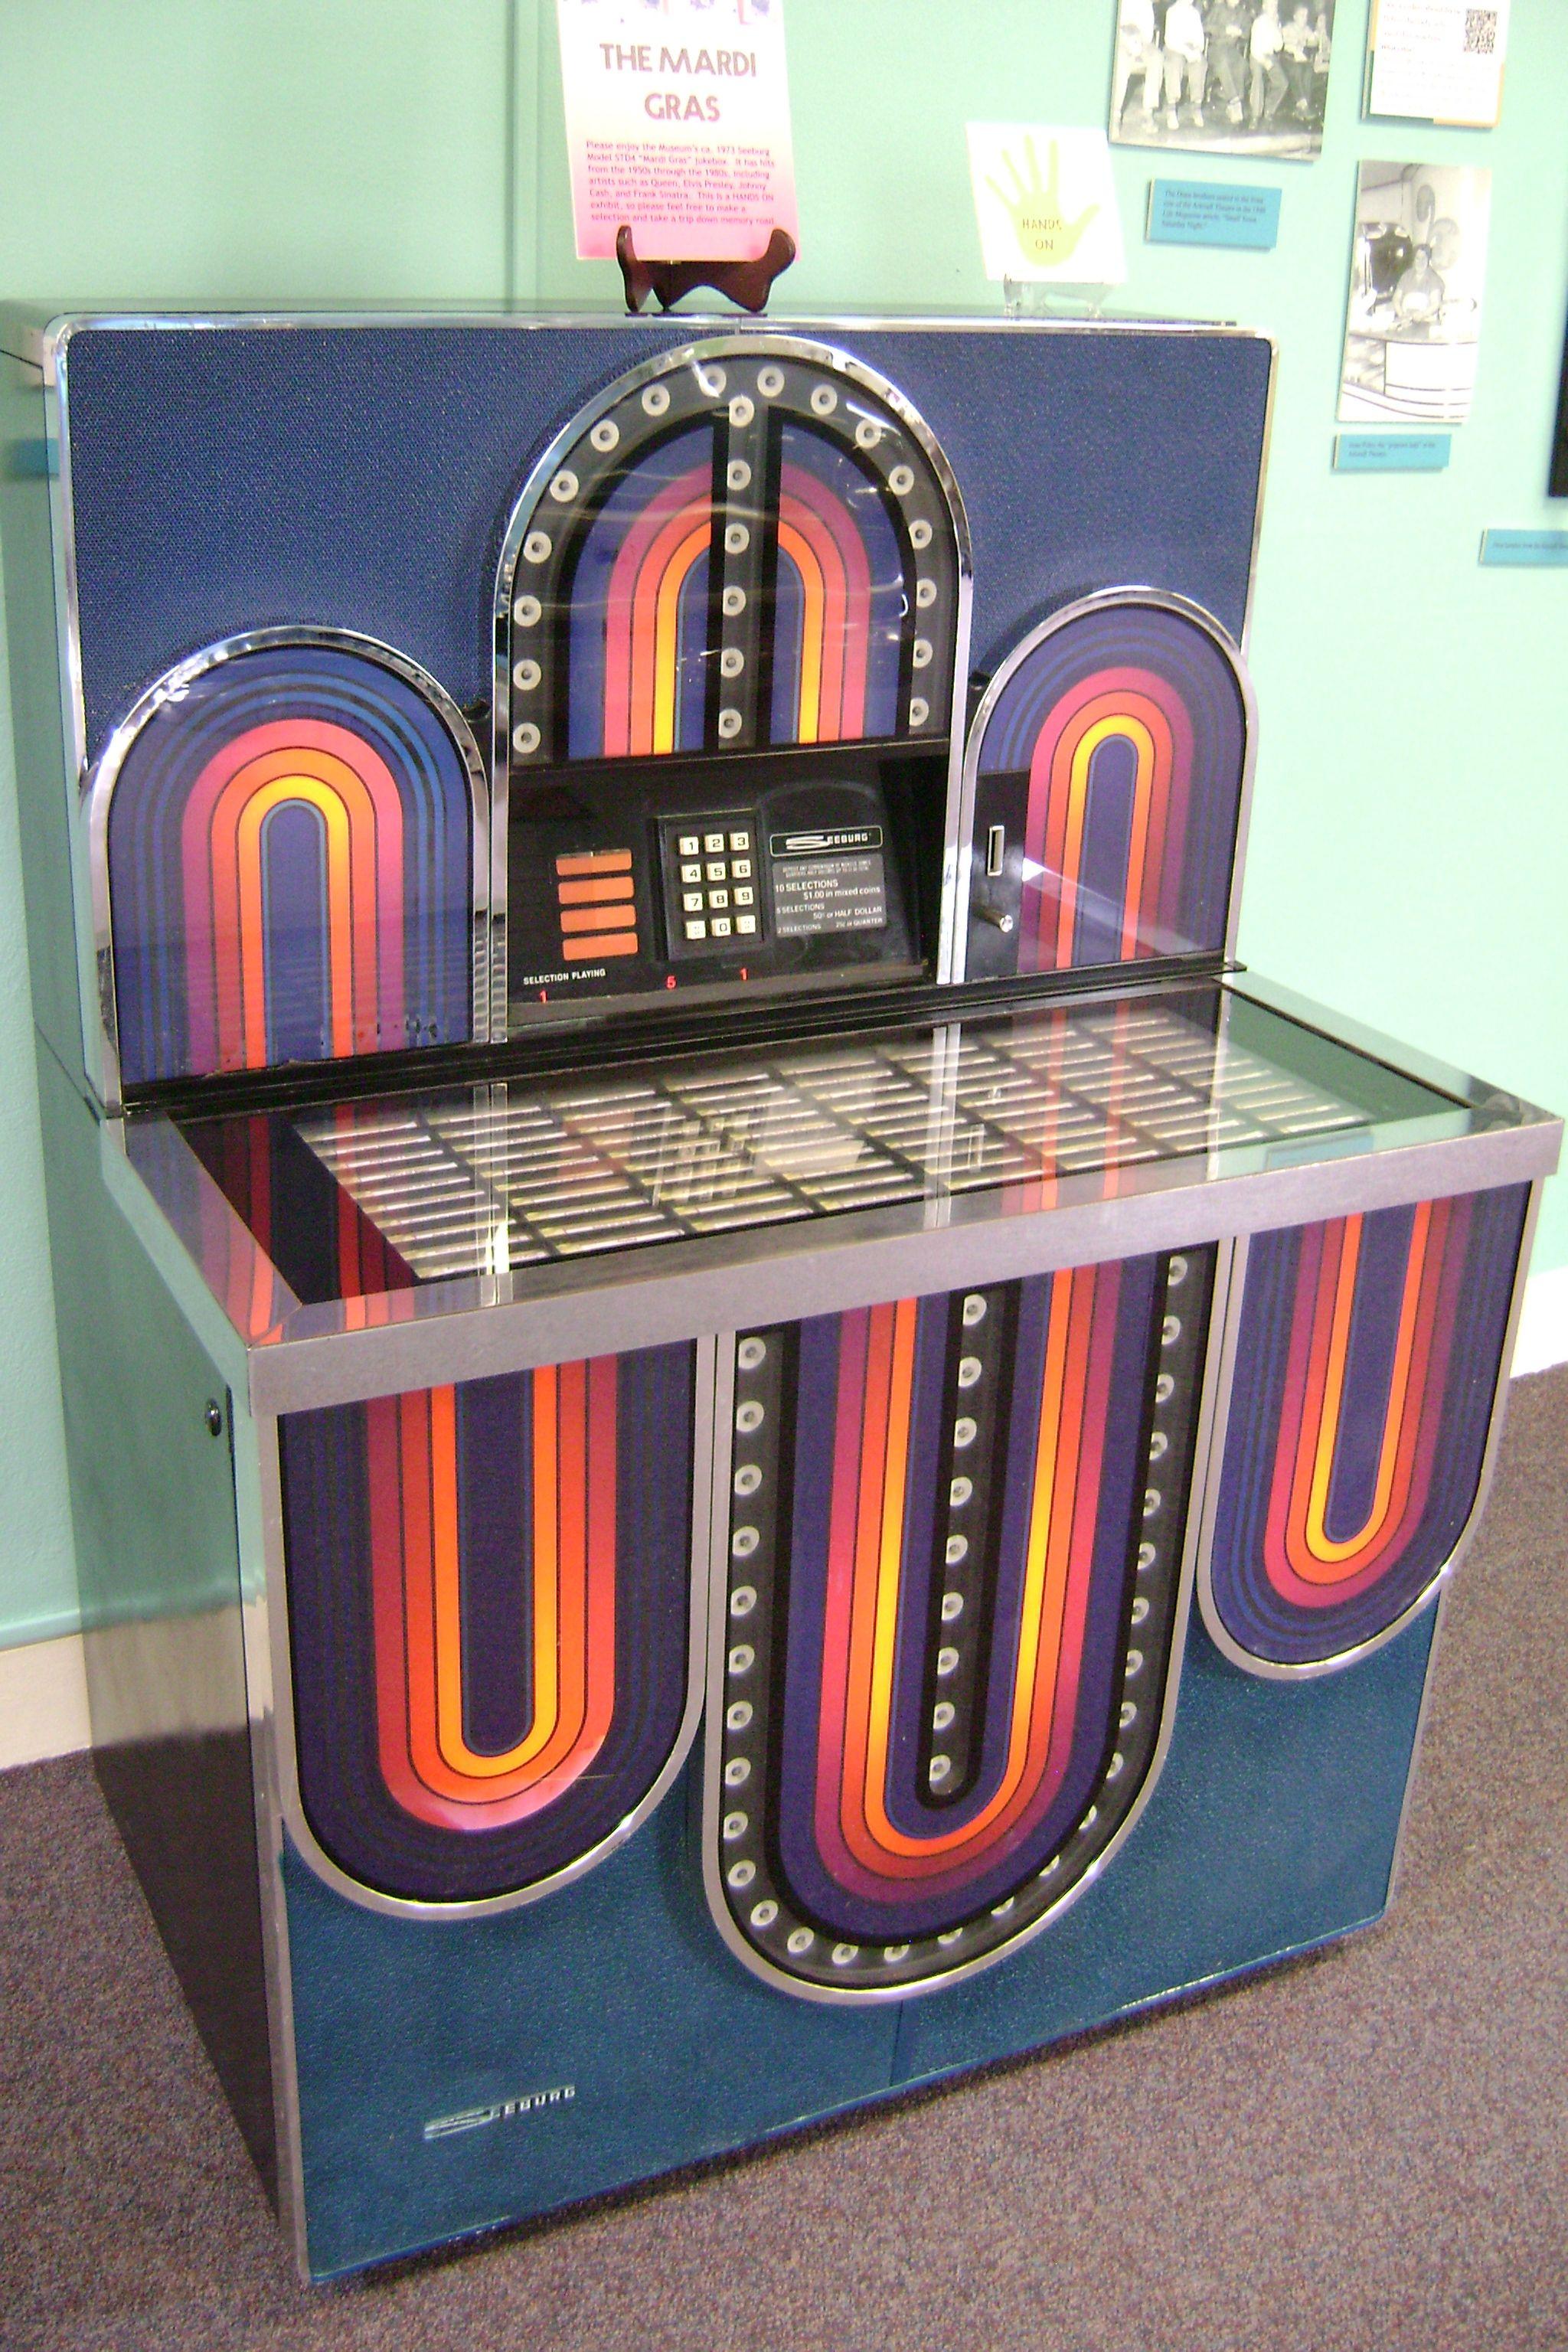 Come in play music on the vintage Seeburg Mardi Gras jukebox